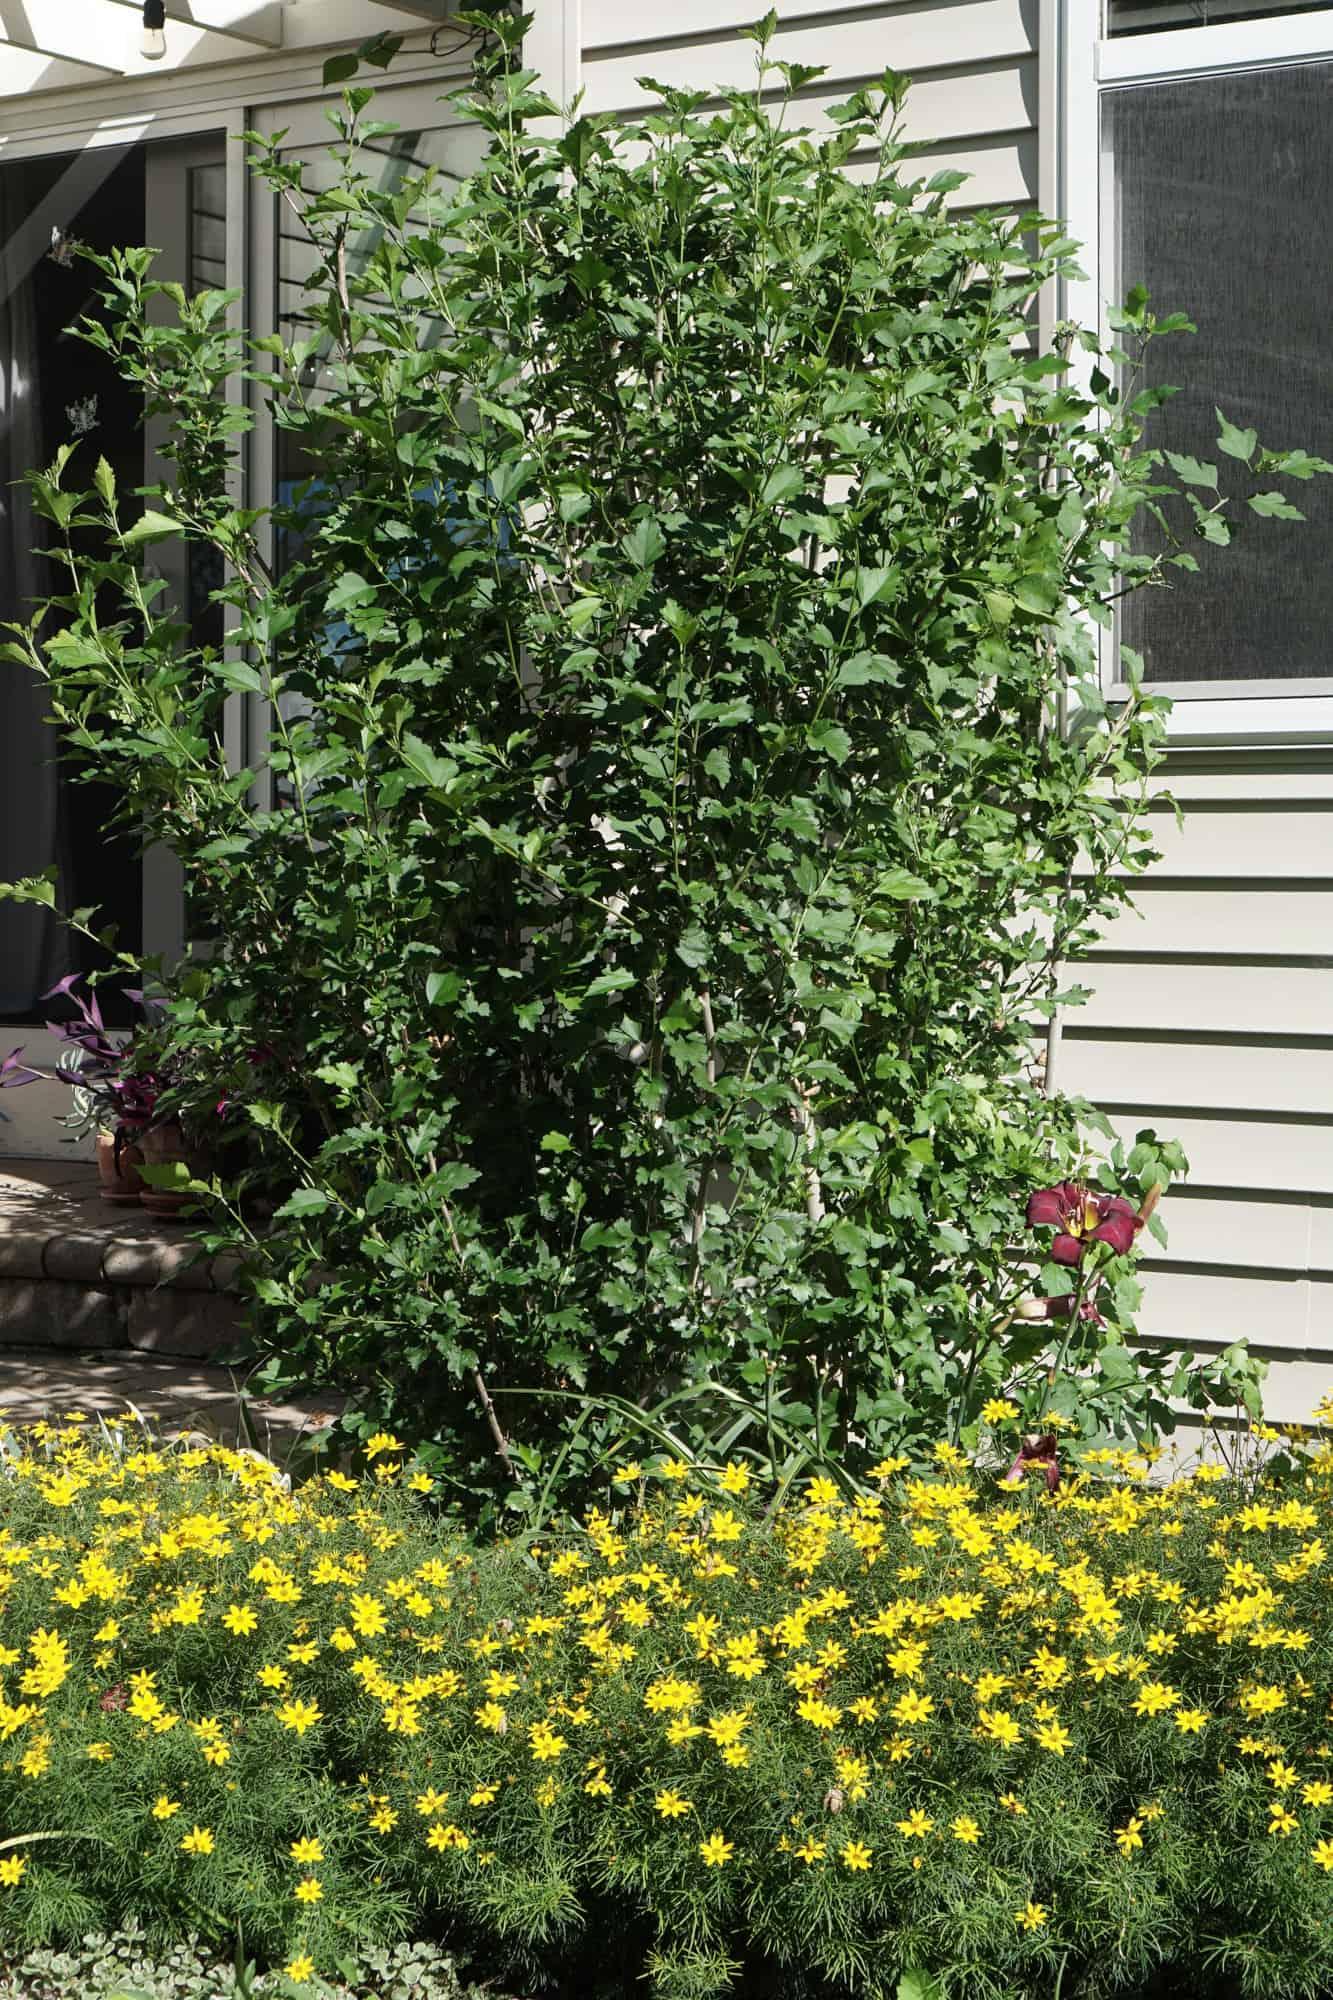 Pruned Rose of Sharon